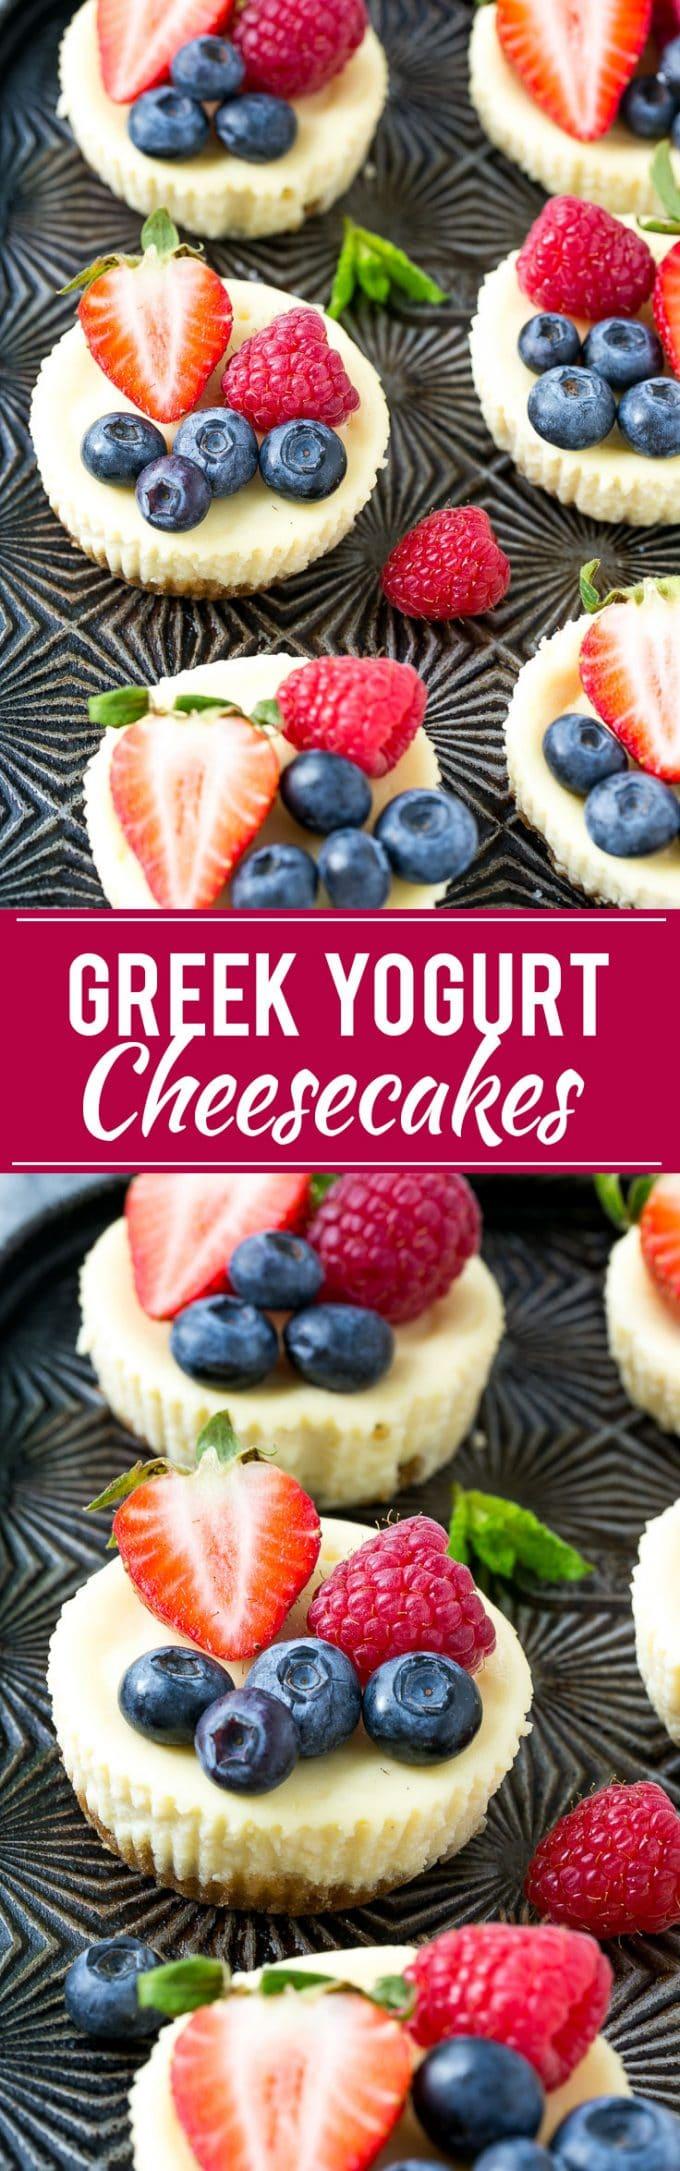 Greek Yogurt Cheesecake Recipe | Mini Cheesecakes | Healthy Cheesecake Recipe | Light Cheesecake Recipe